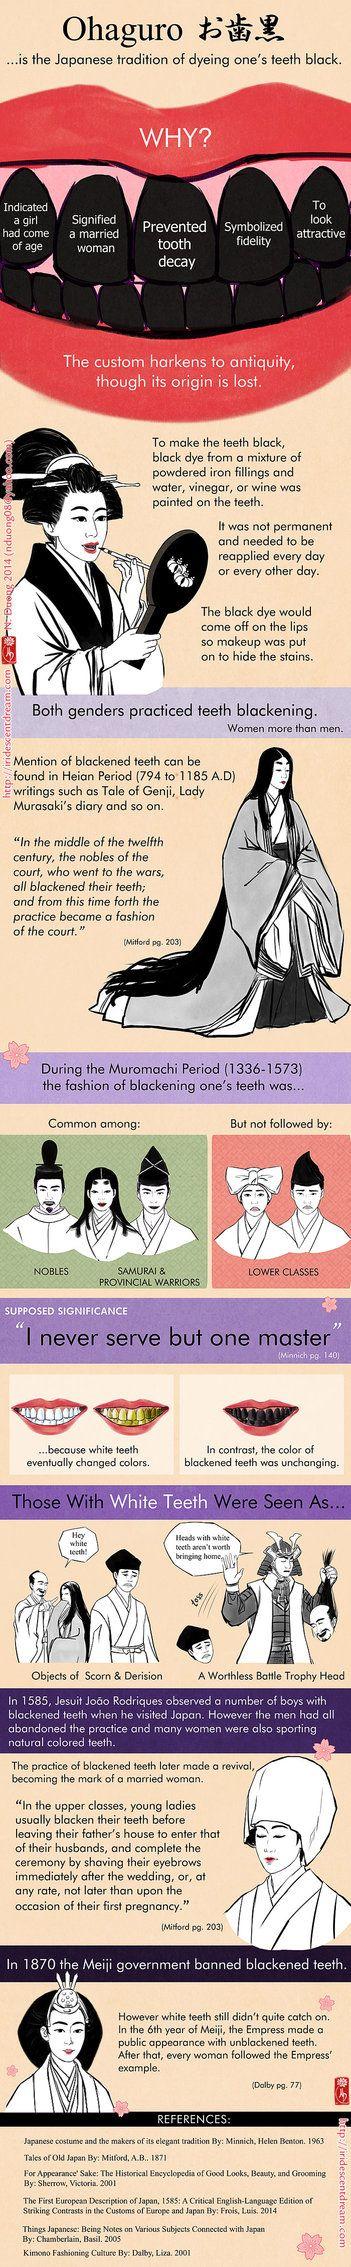 Fashion of Black Teeth in Old Japan by lilsuika on DeviantArt